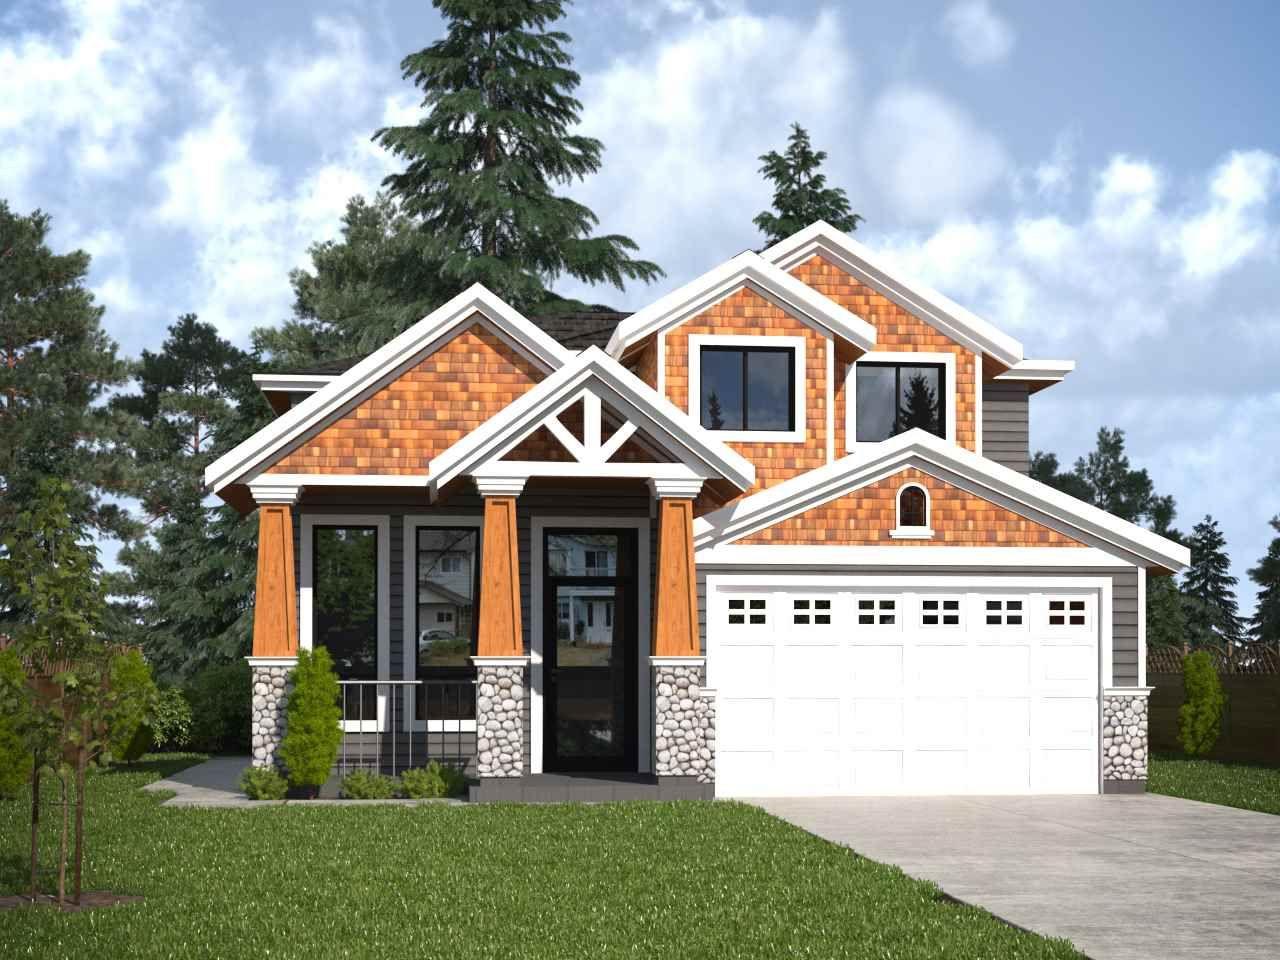 Main Photo: 9501 116 STREET in Delta: Annieville House for sale (N. Delta)  : MLS®# R2007689